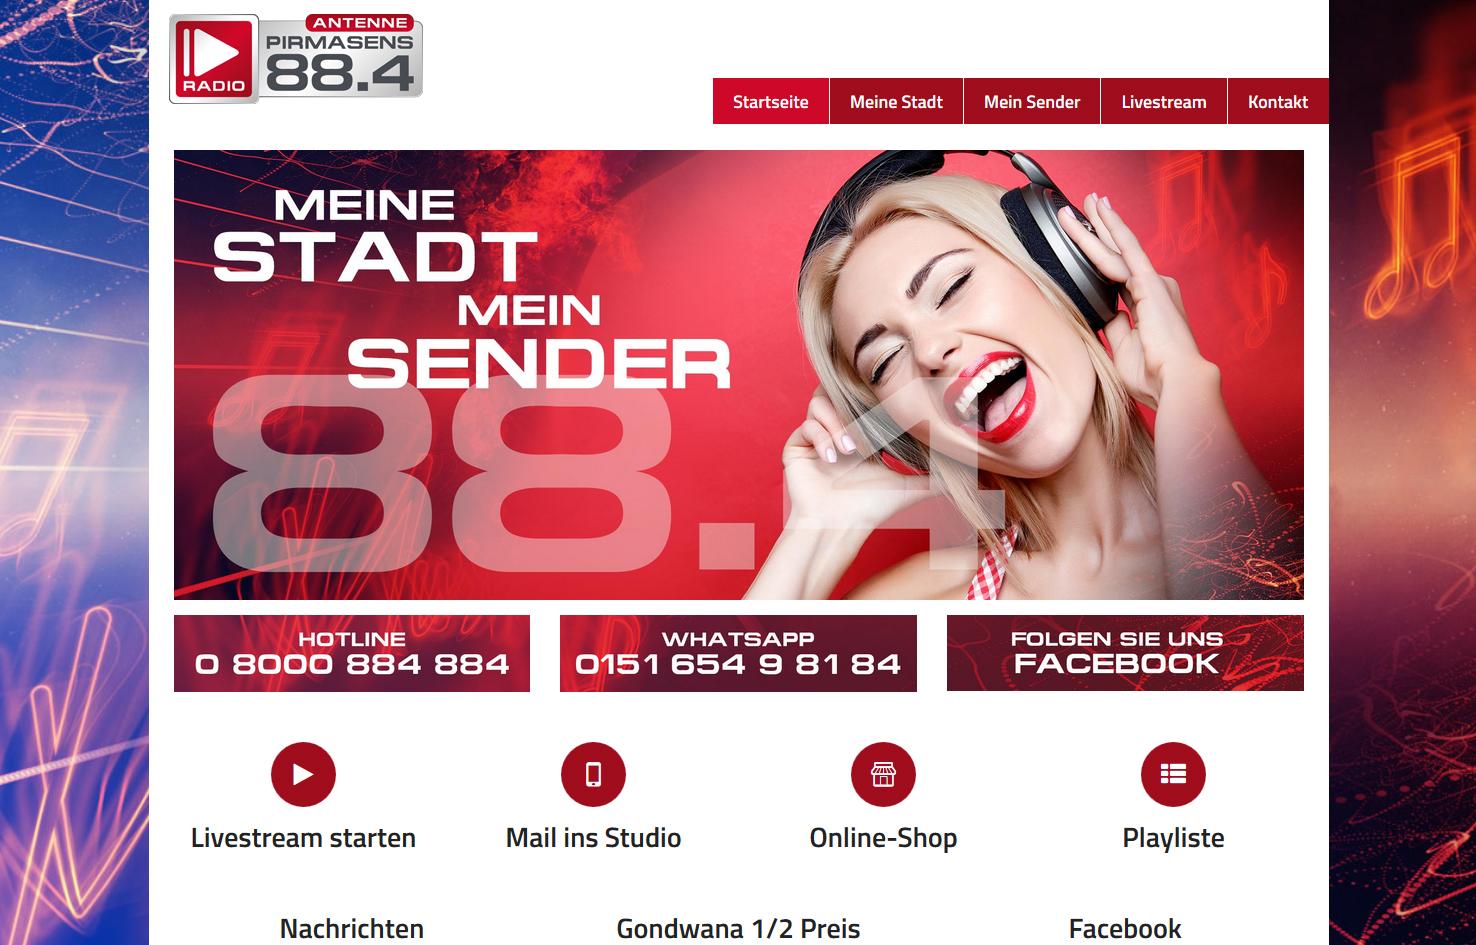 Antenne Pirmasens | Rundfunk